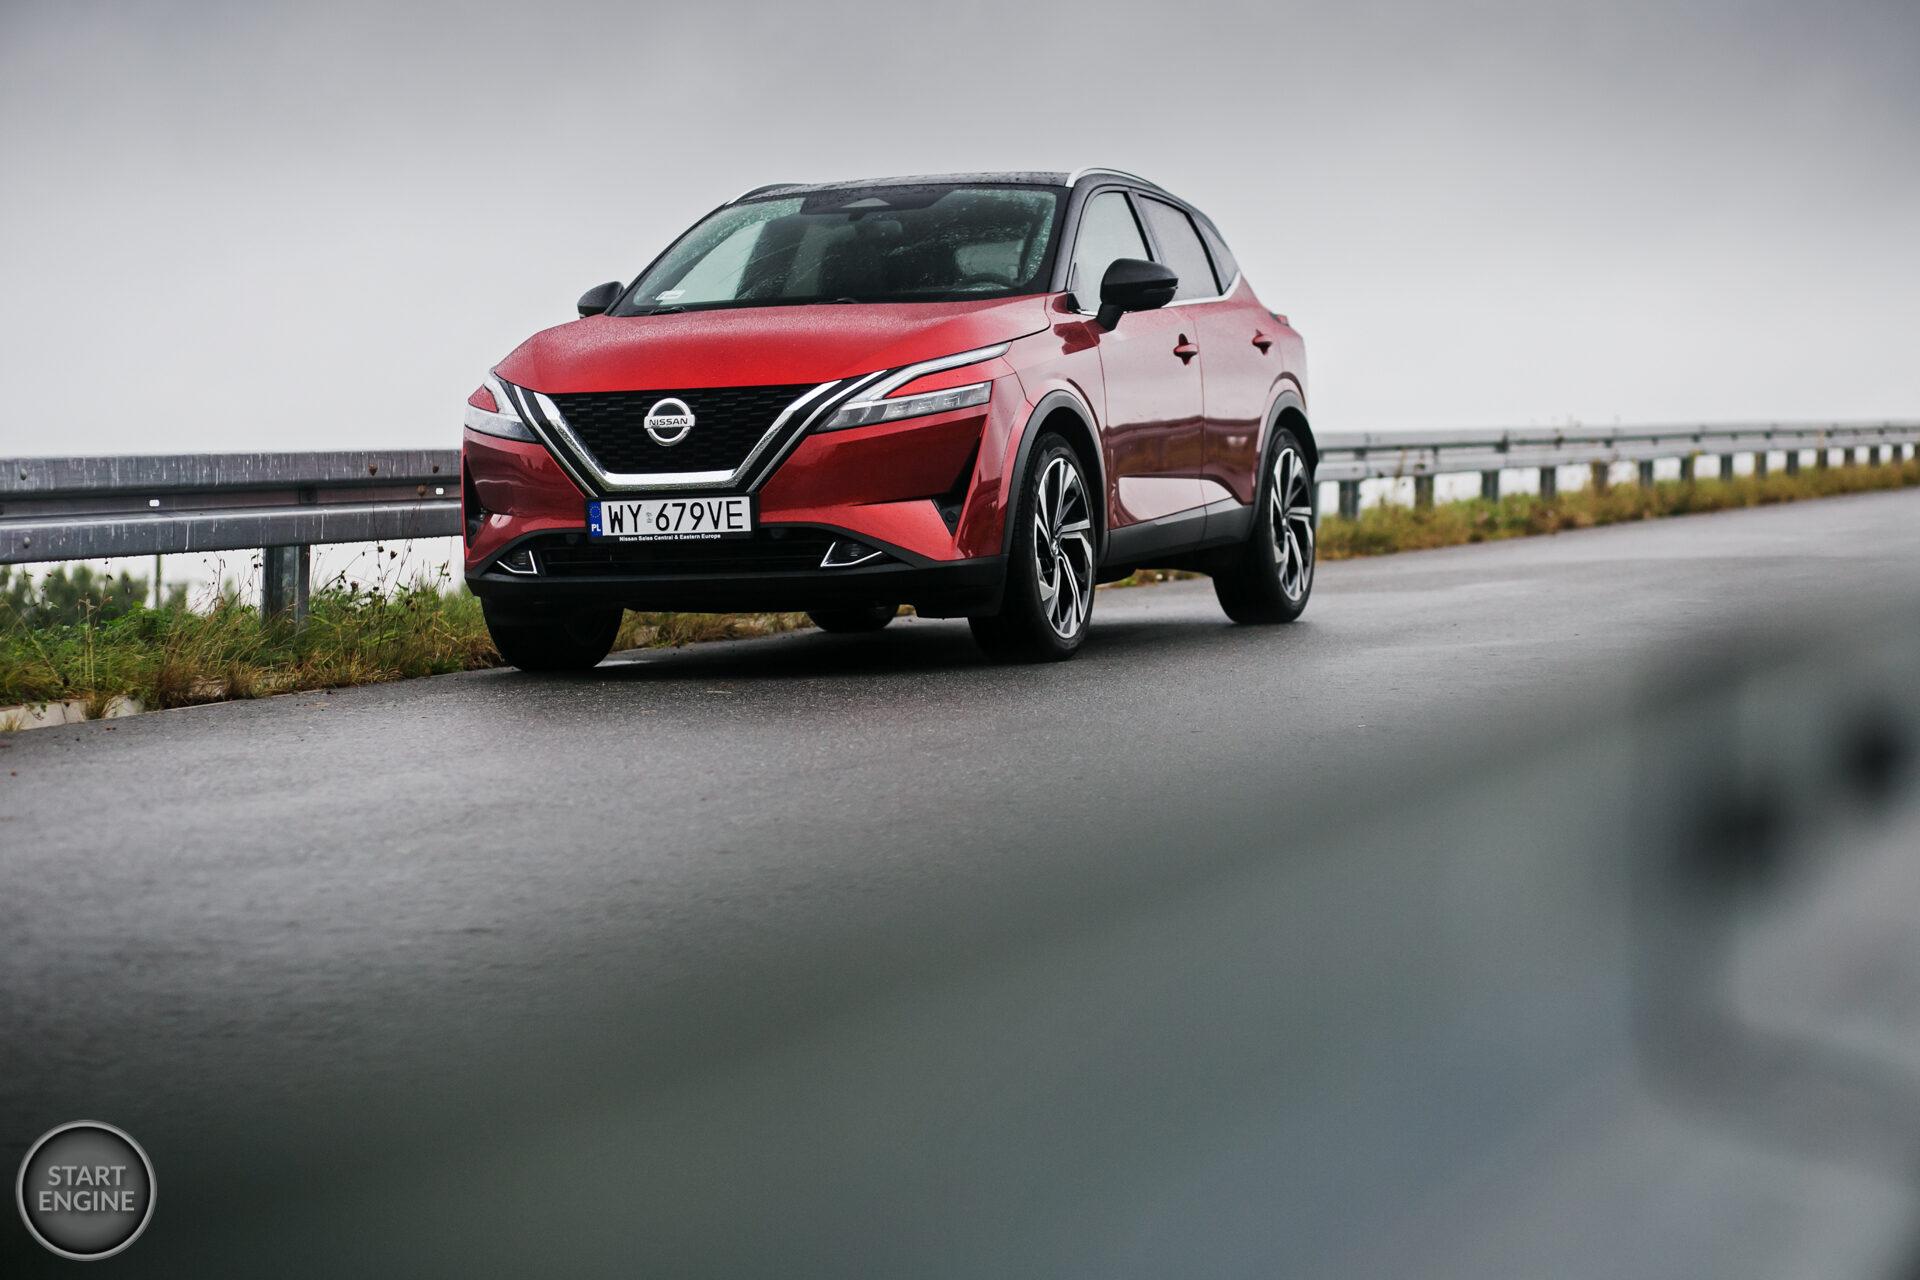 Nowy Nissan Qashqai (2021)